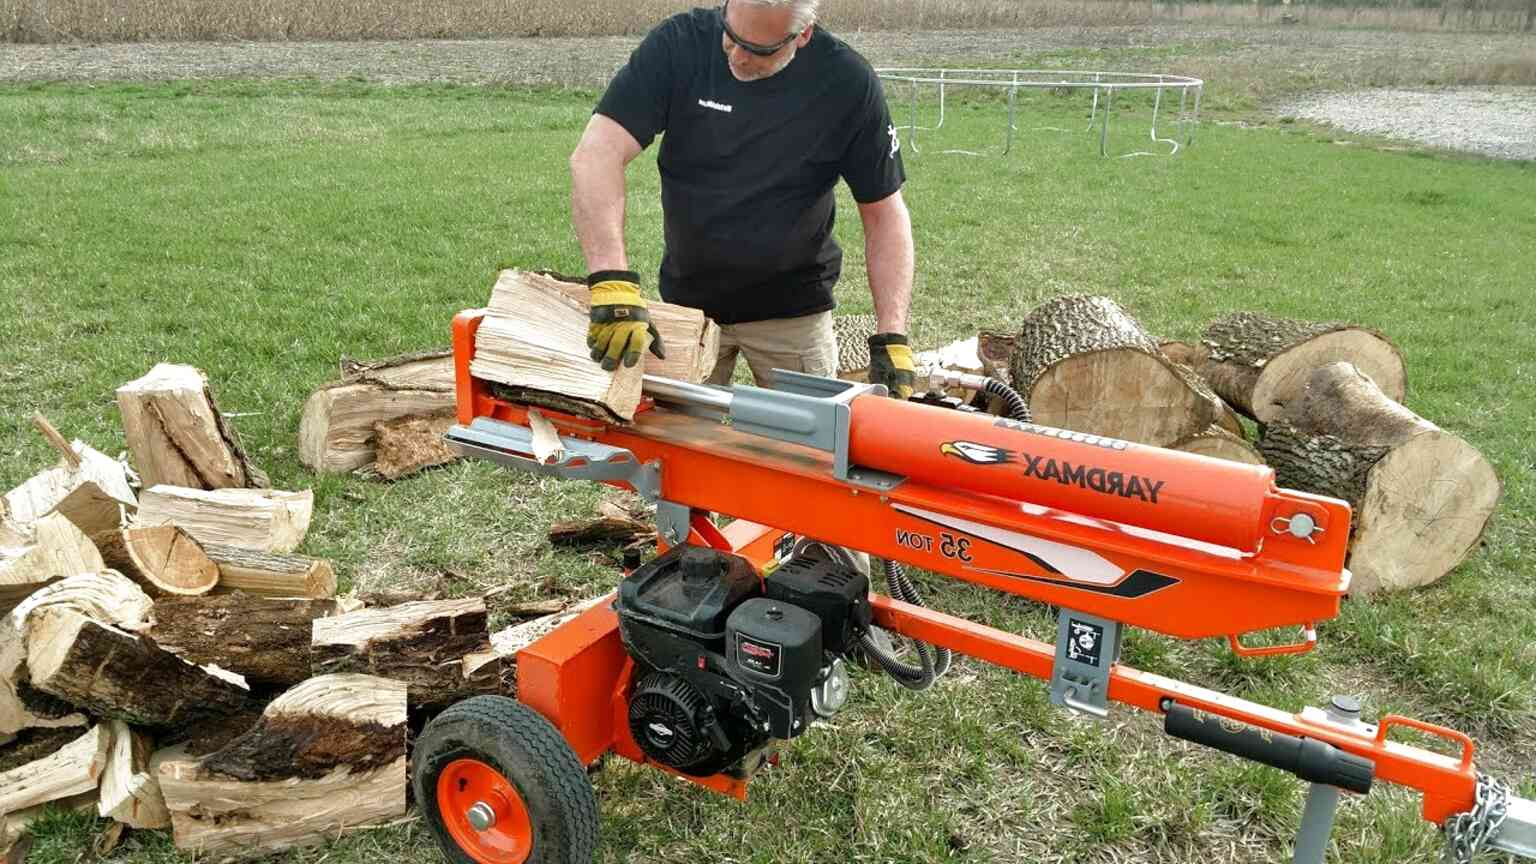 Wood Log Splitter for sale in Canada